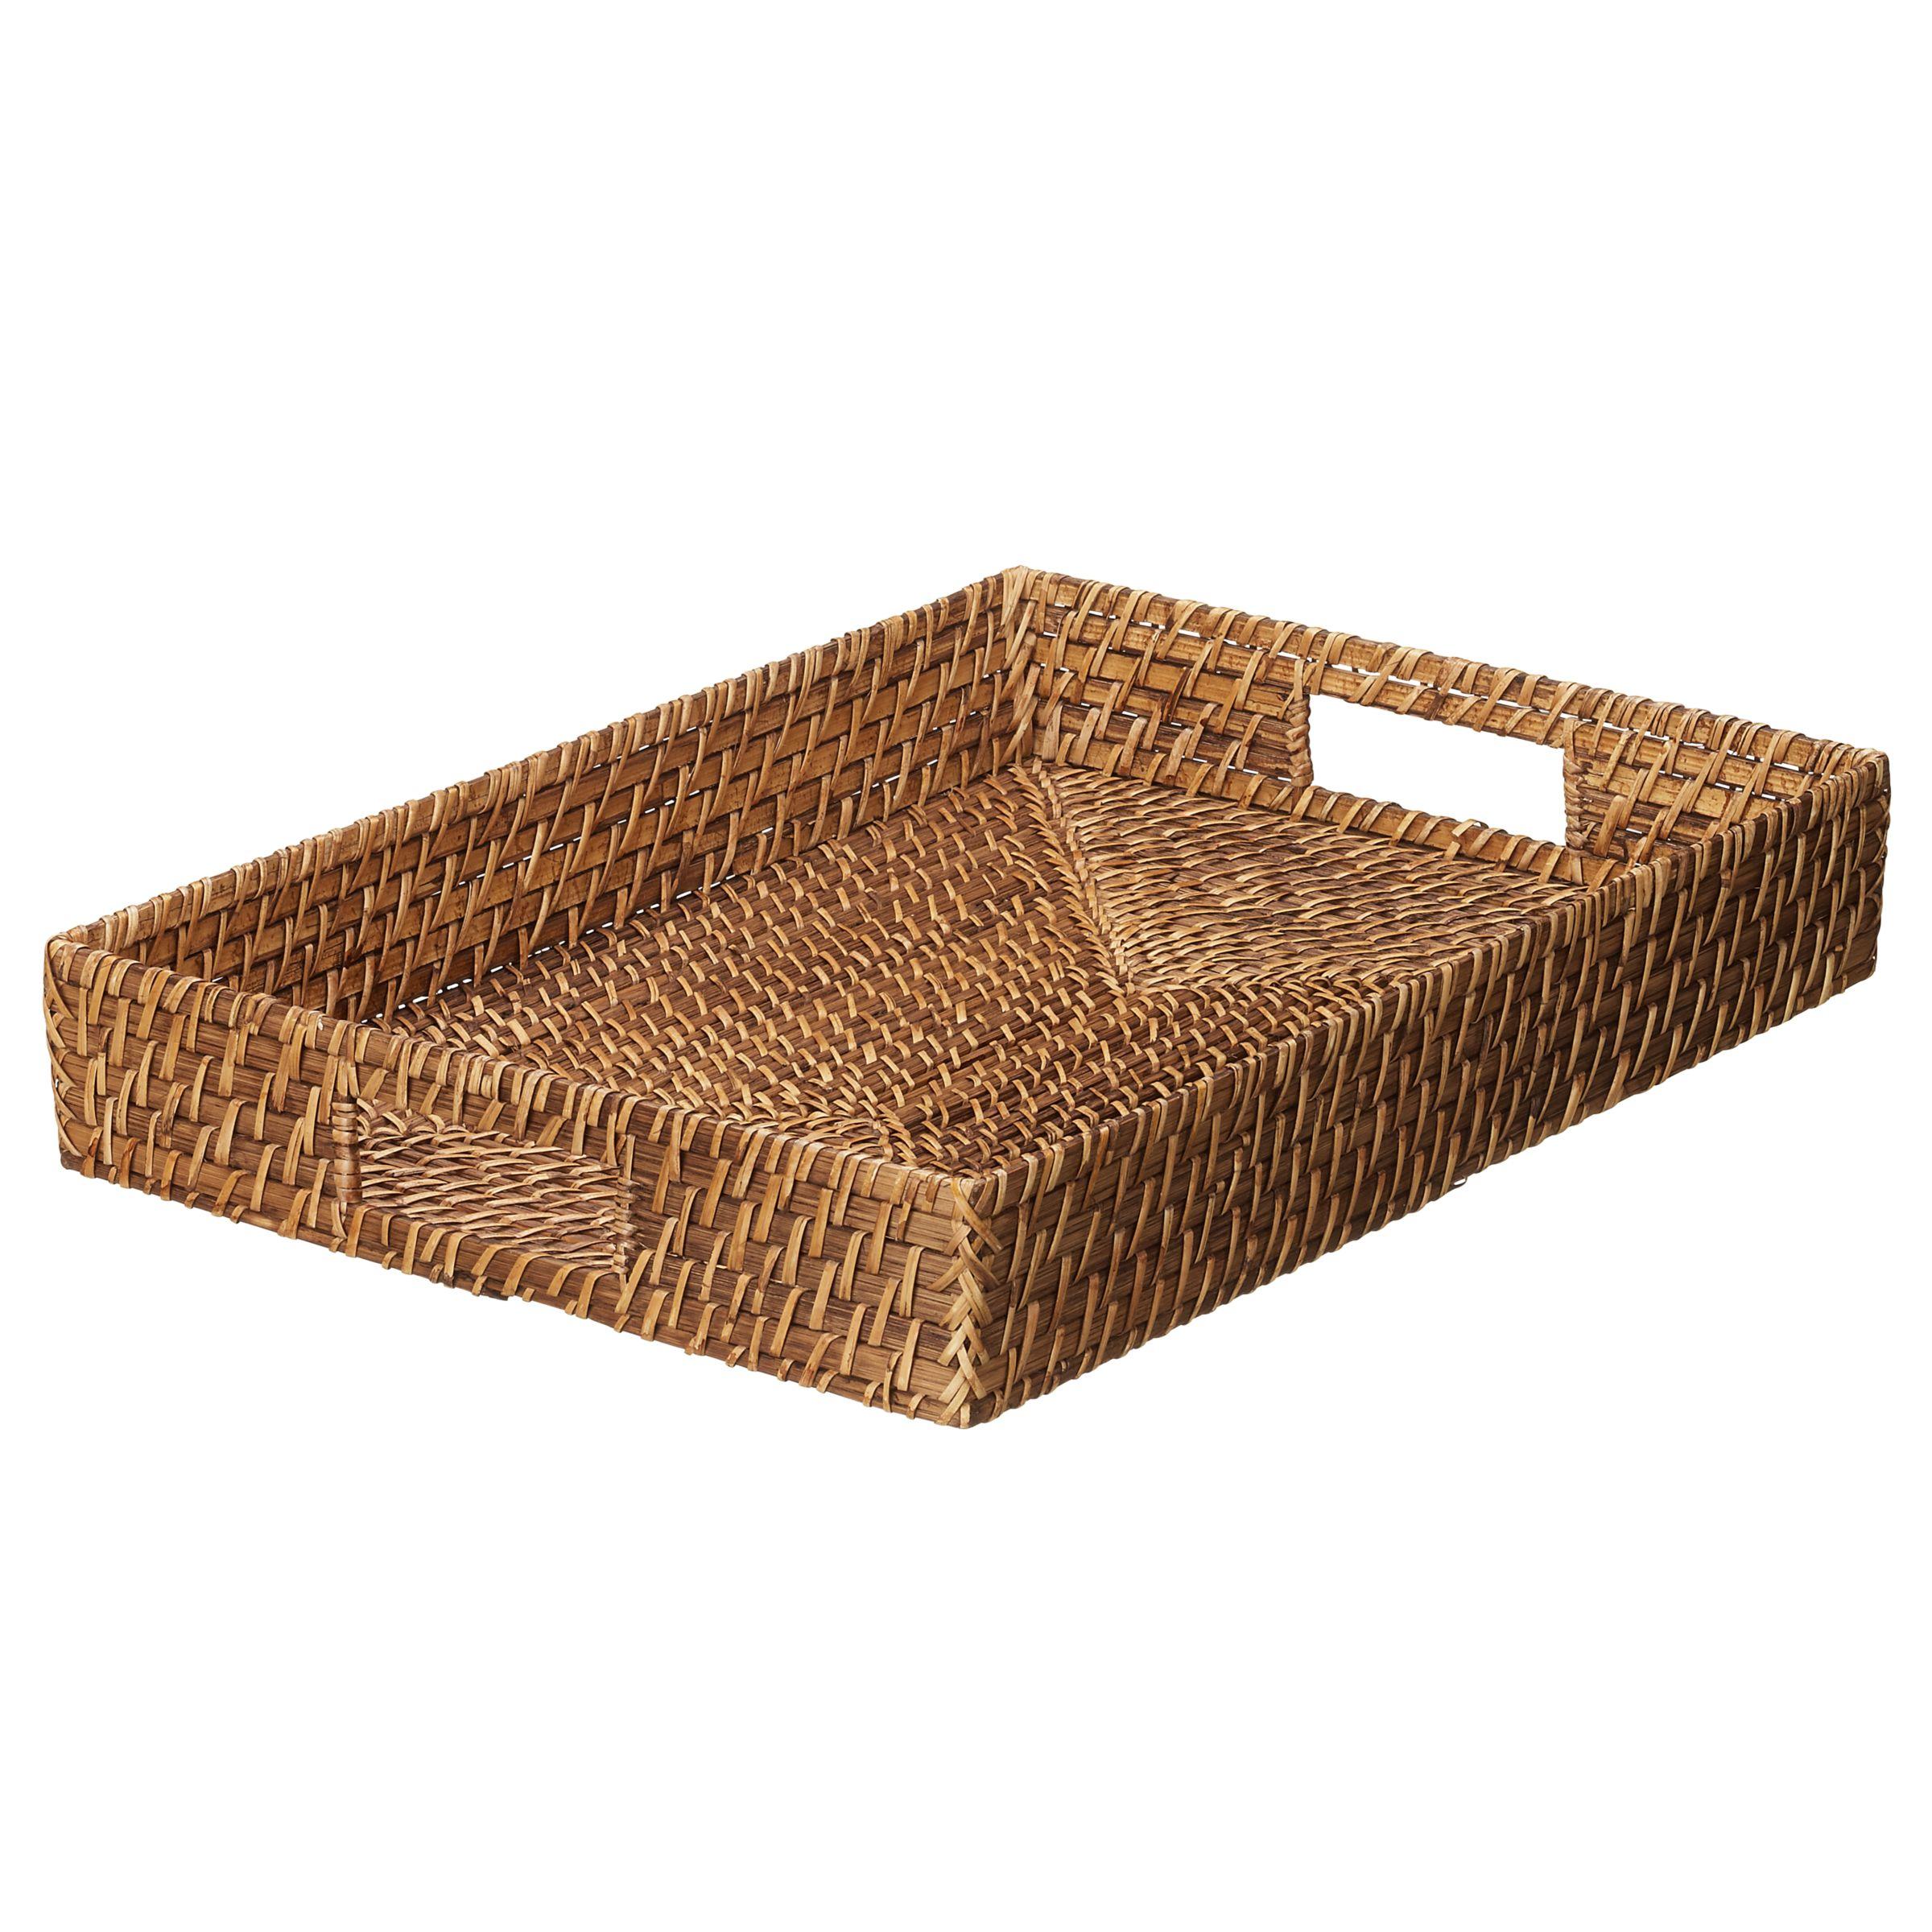 John Lewis Bamboo & Rattan Tray, Nutmeg